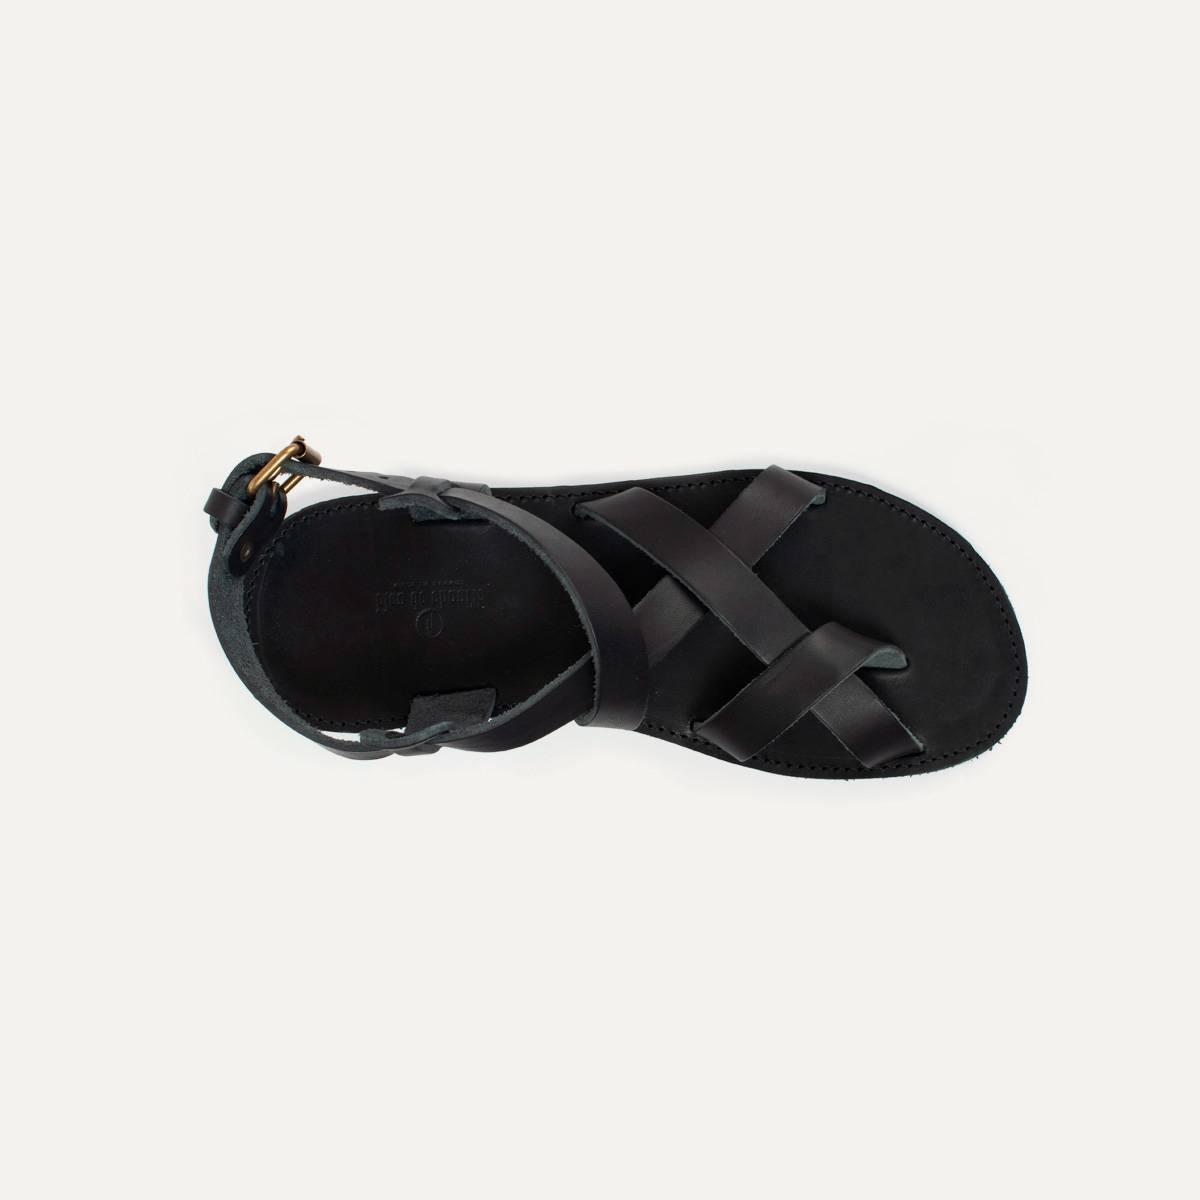 Lhassa leather sandals - Black (image n°6)